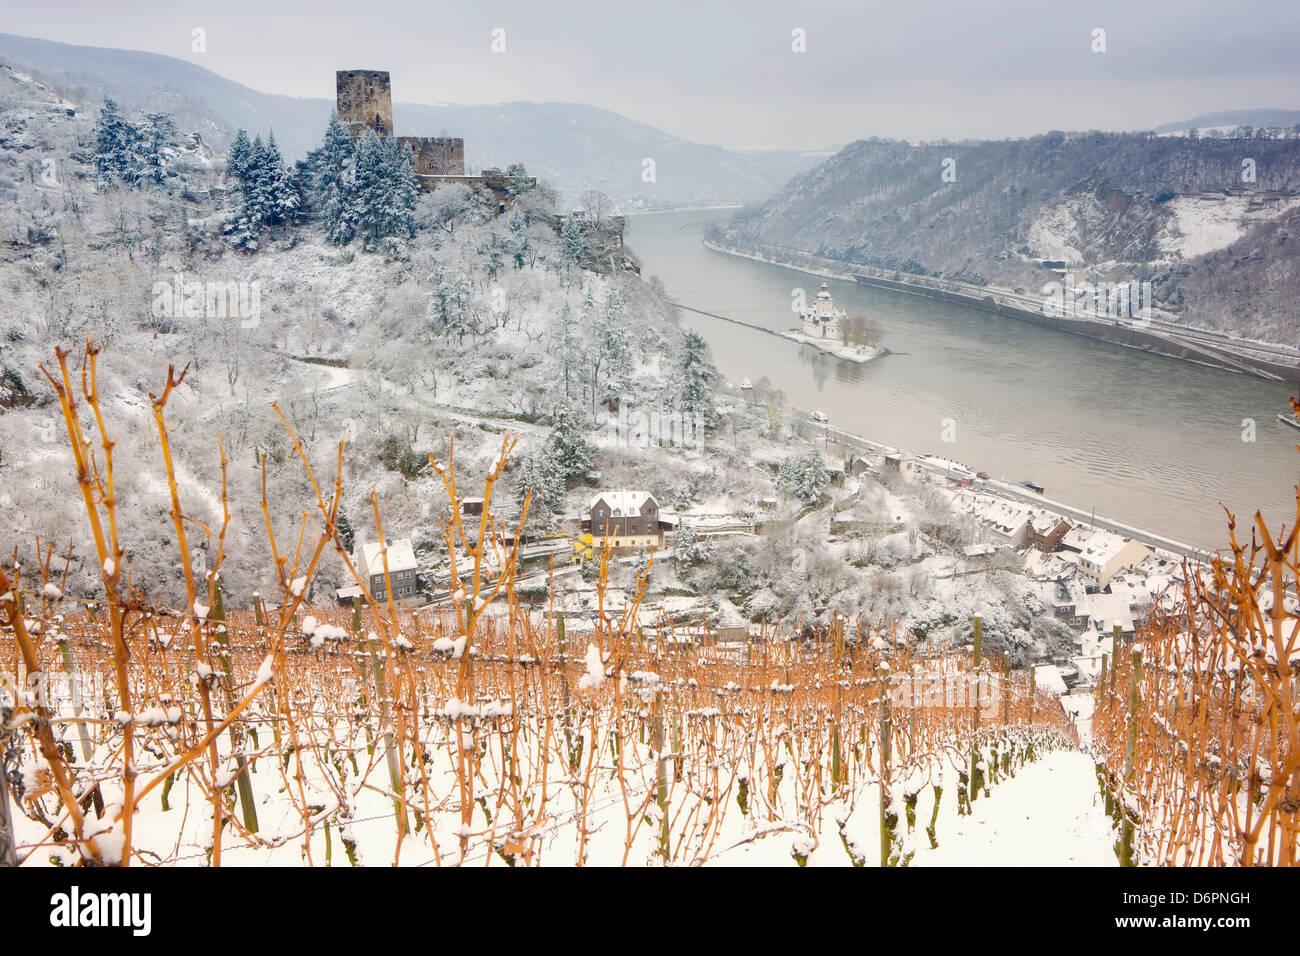 The Rhine River, Pfalz Castle and Gutenfels Castle in winter, Rheinland-Pfalz, Germany, Europe - Stock Image